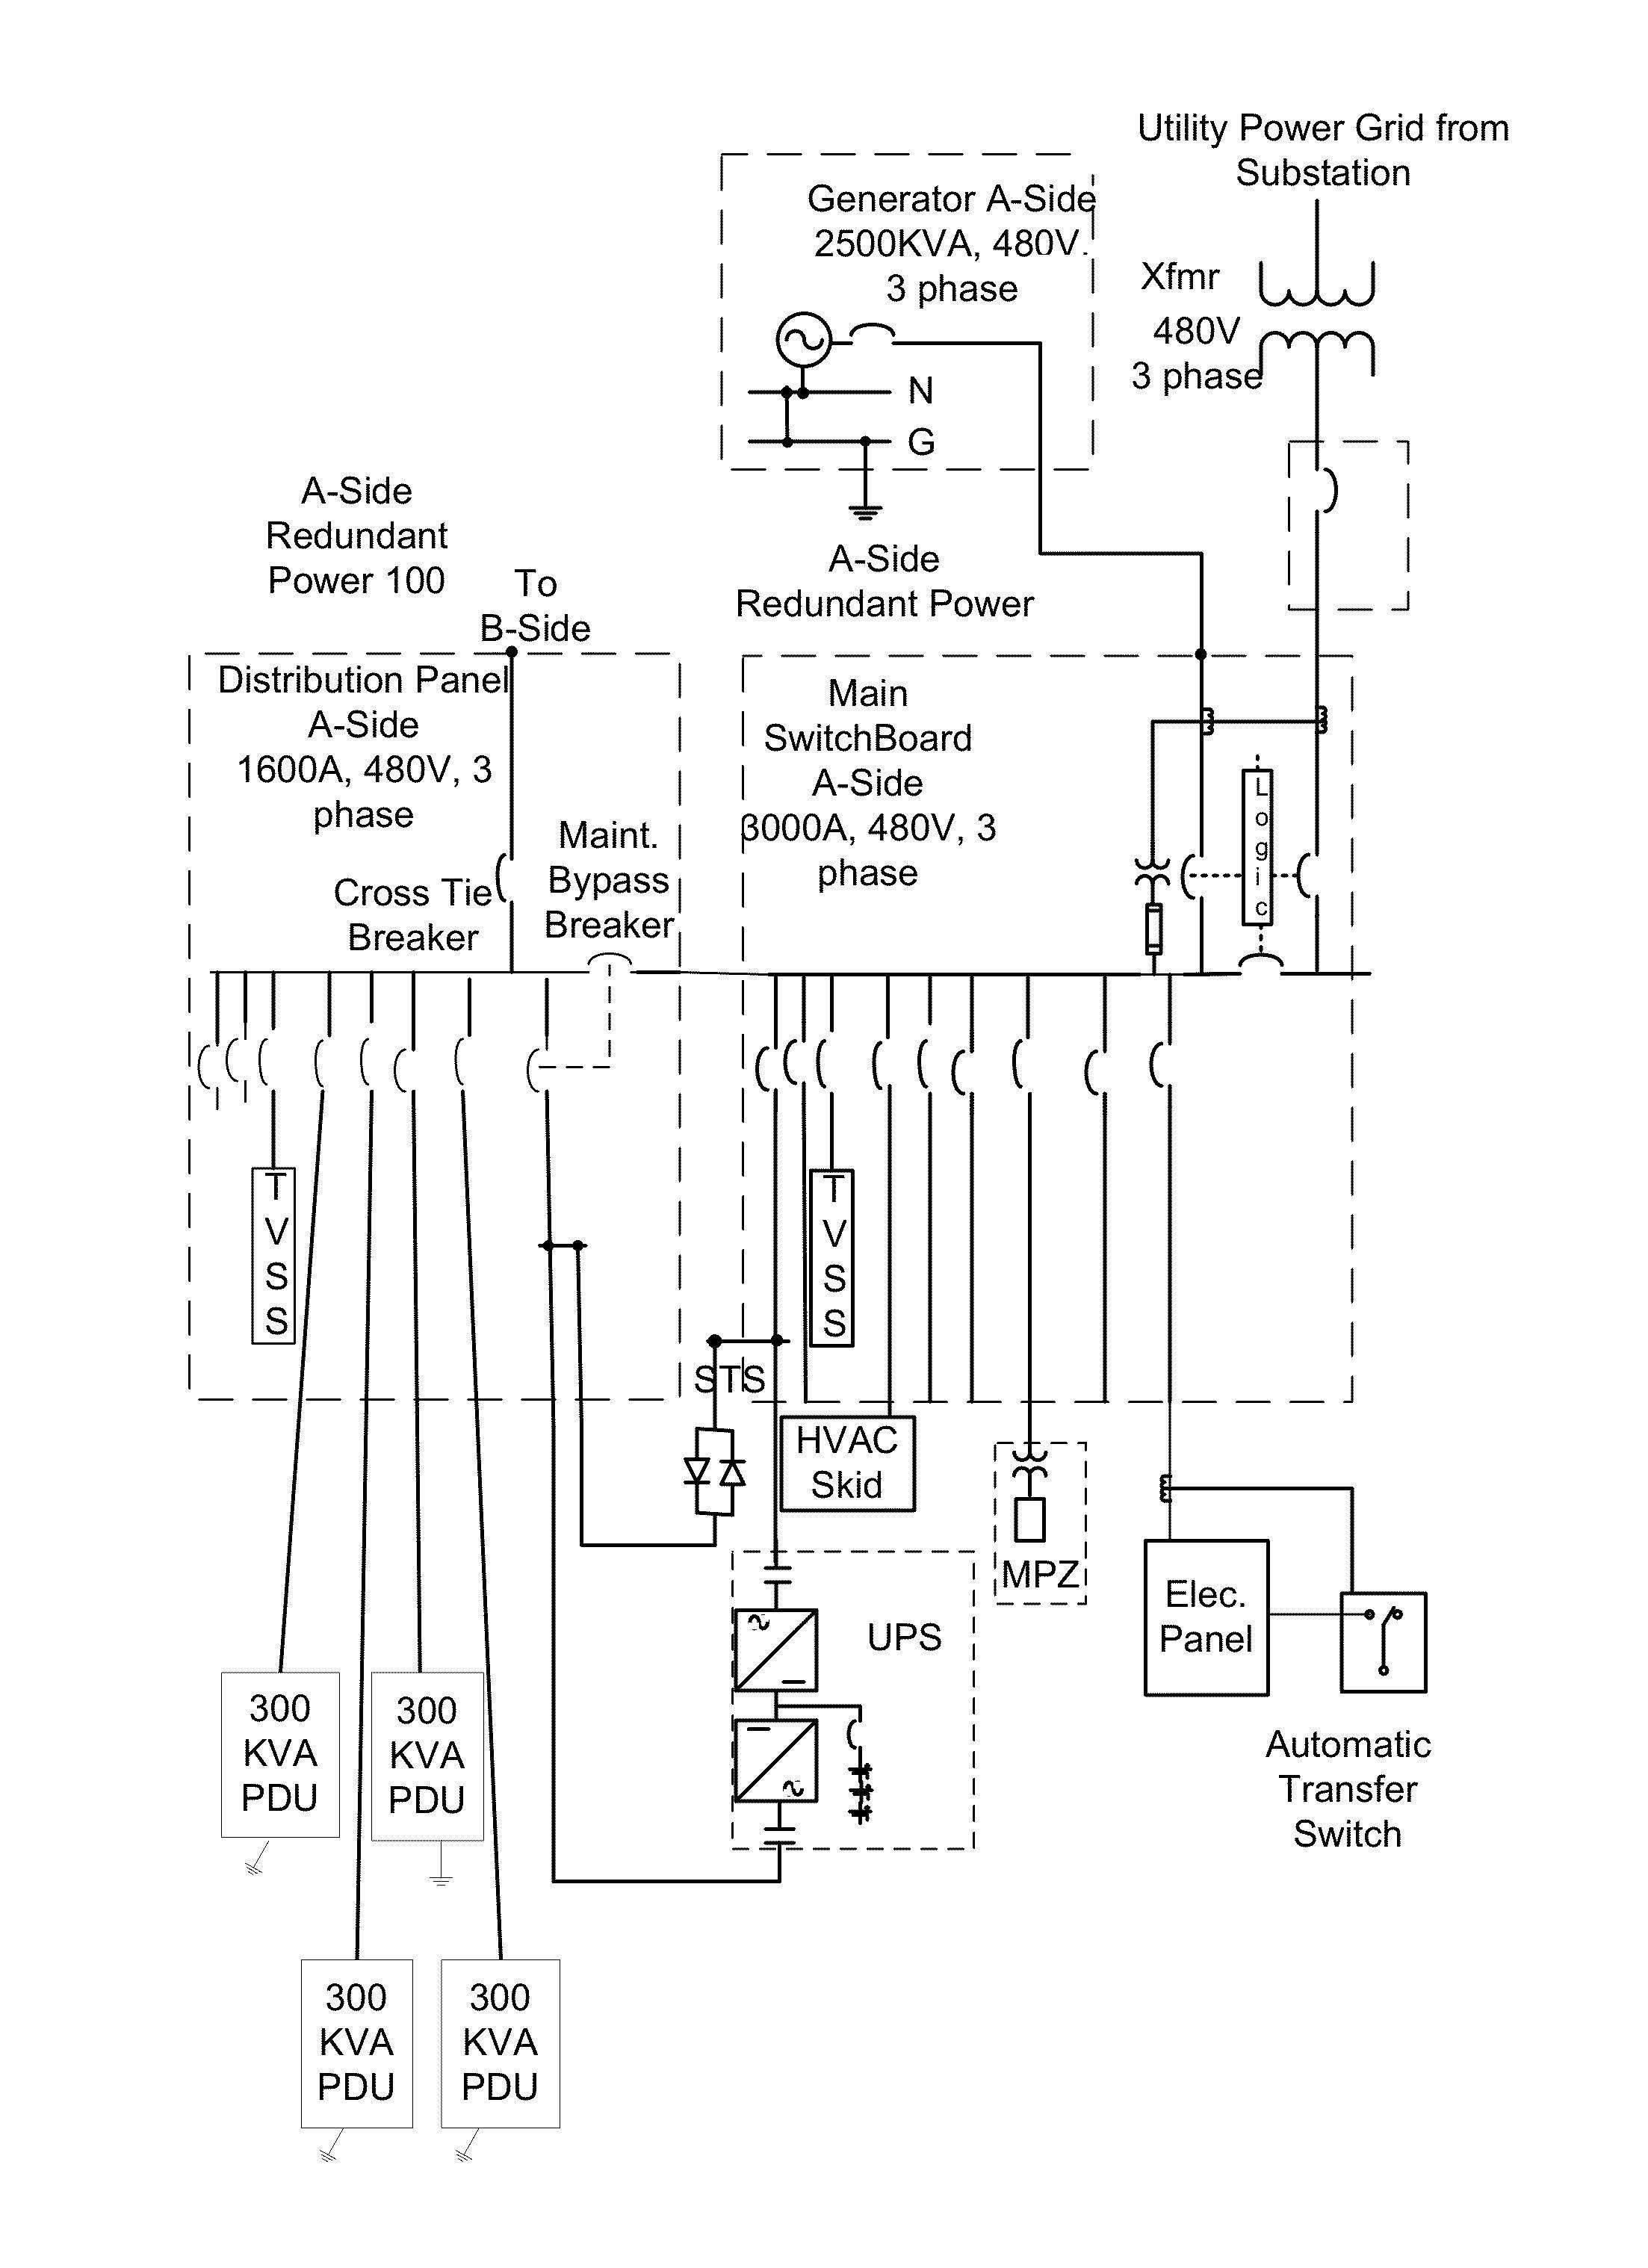 wiring diagram bathroom lovely wiring diagram bathroom bathroom fan light wiring diagram mikulskilawoffices [ 2206 x 3036 Pixel ]